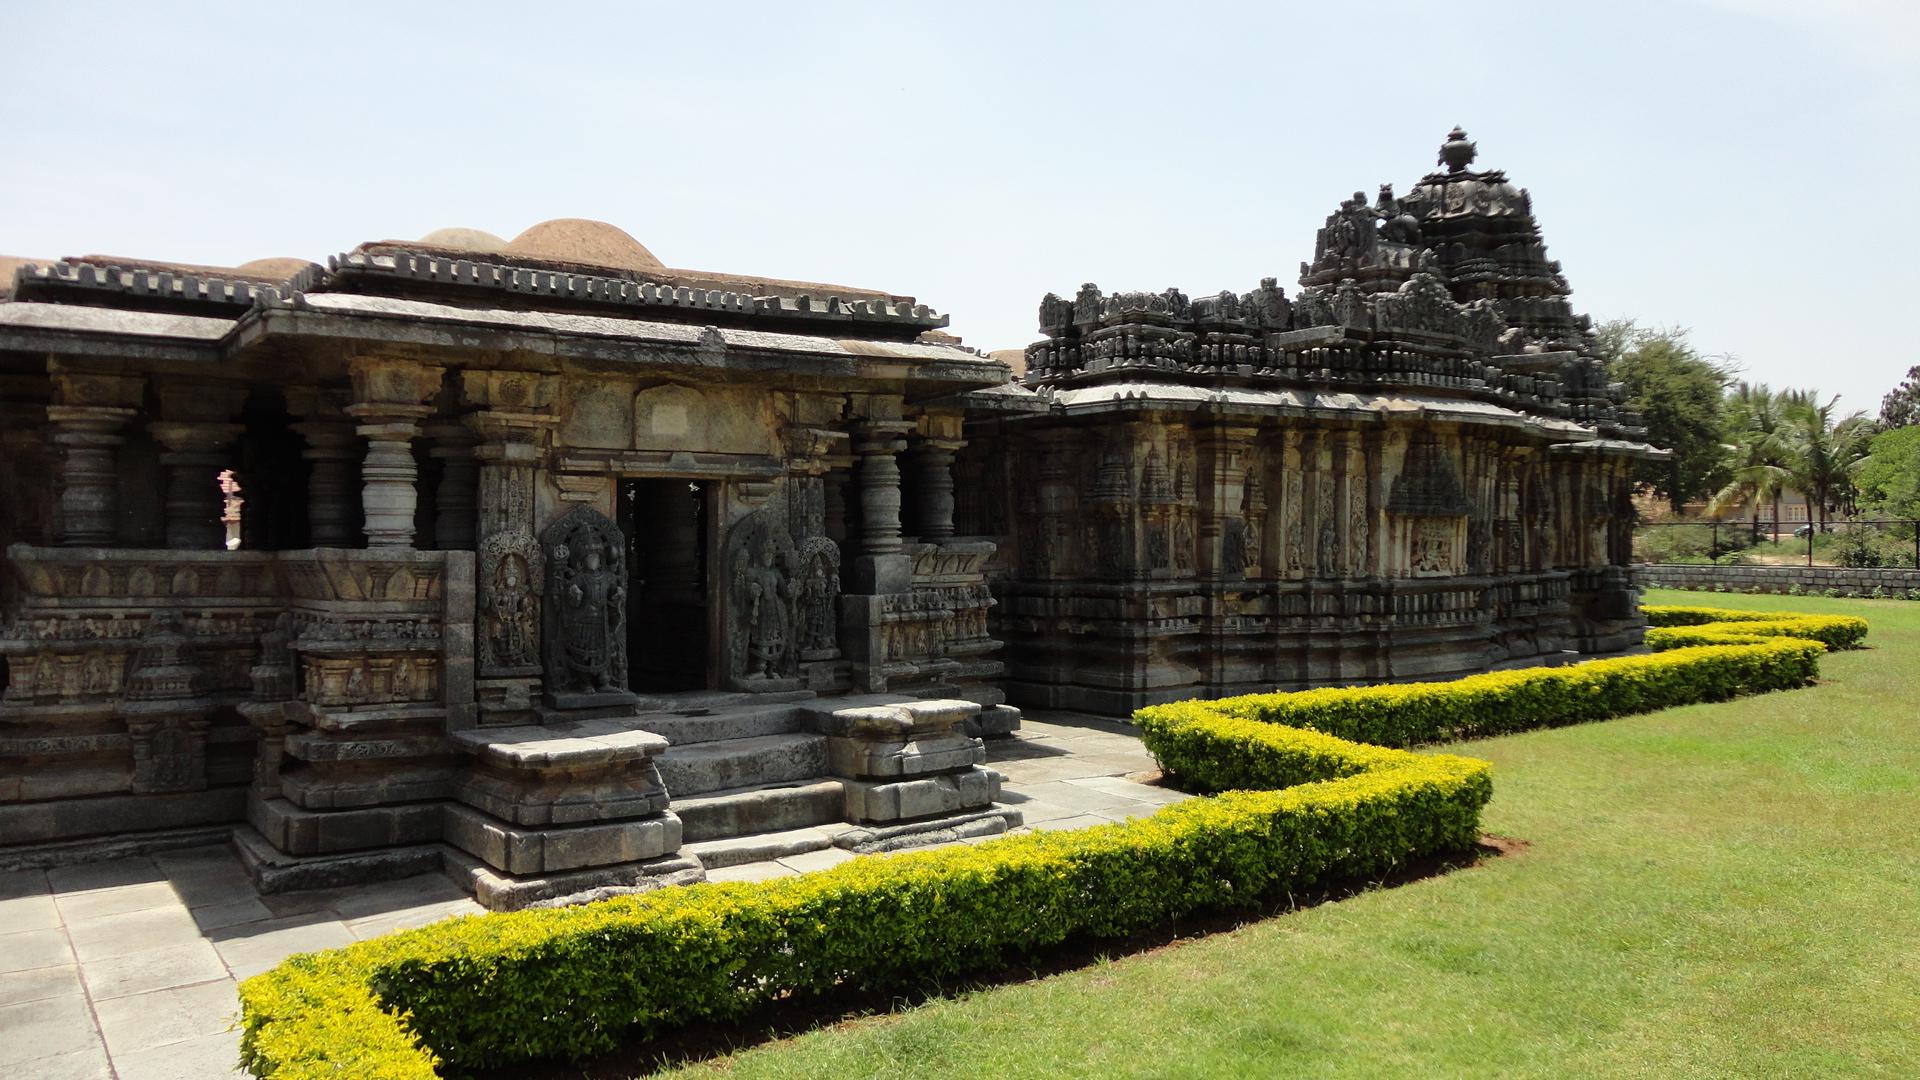 Wallpaper Hd King File Buchesvara Temple At Koravangala In The Hassan